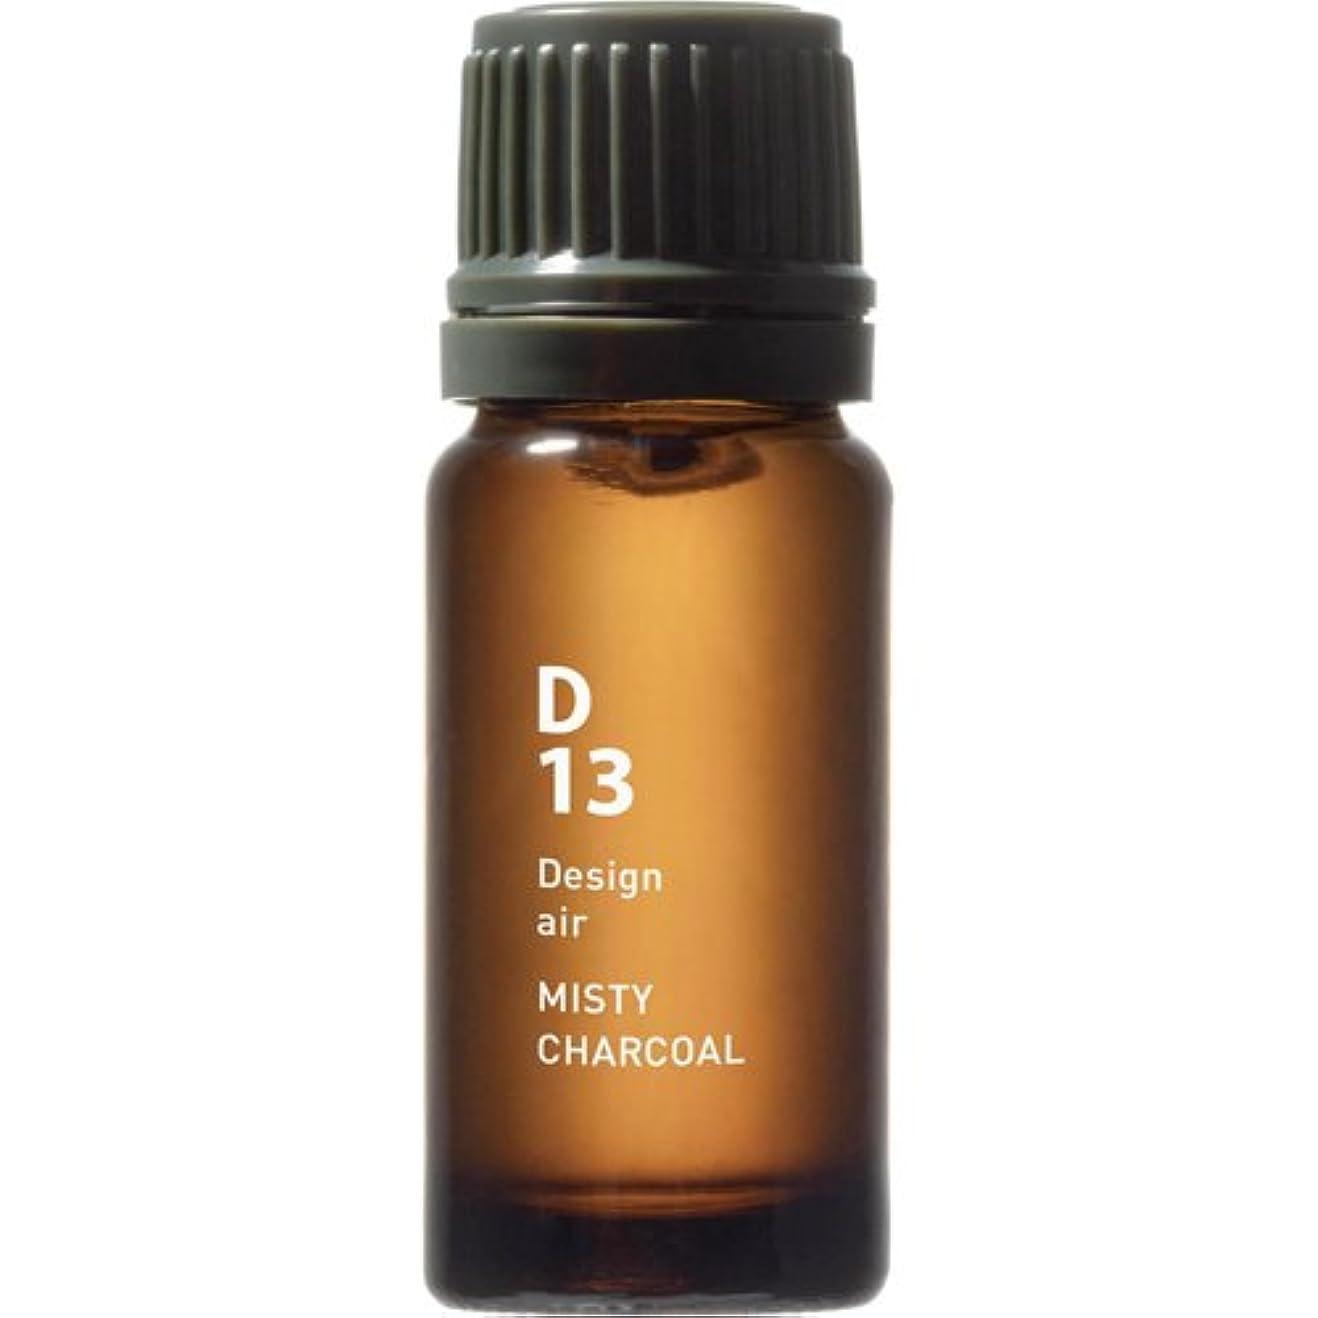 D13 MISTY CHARCOAL Design air 10ml